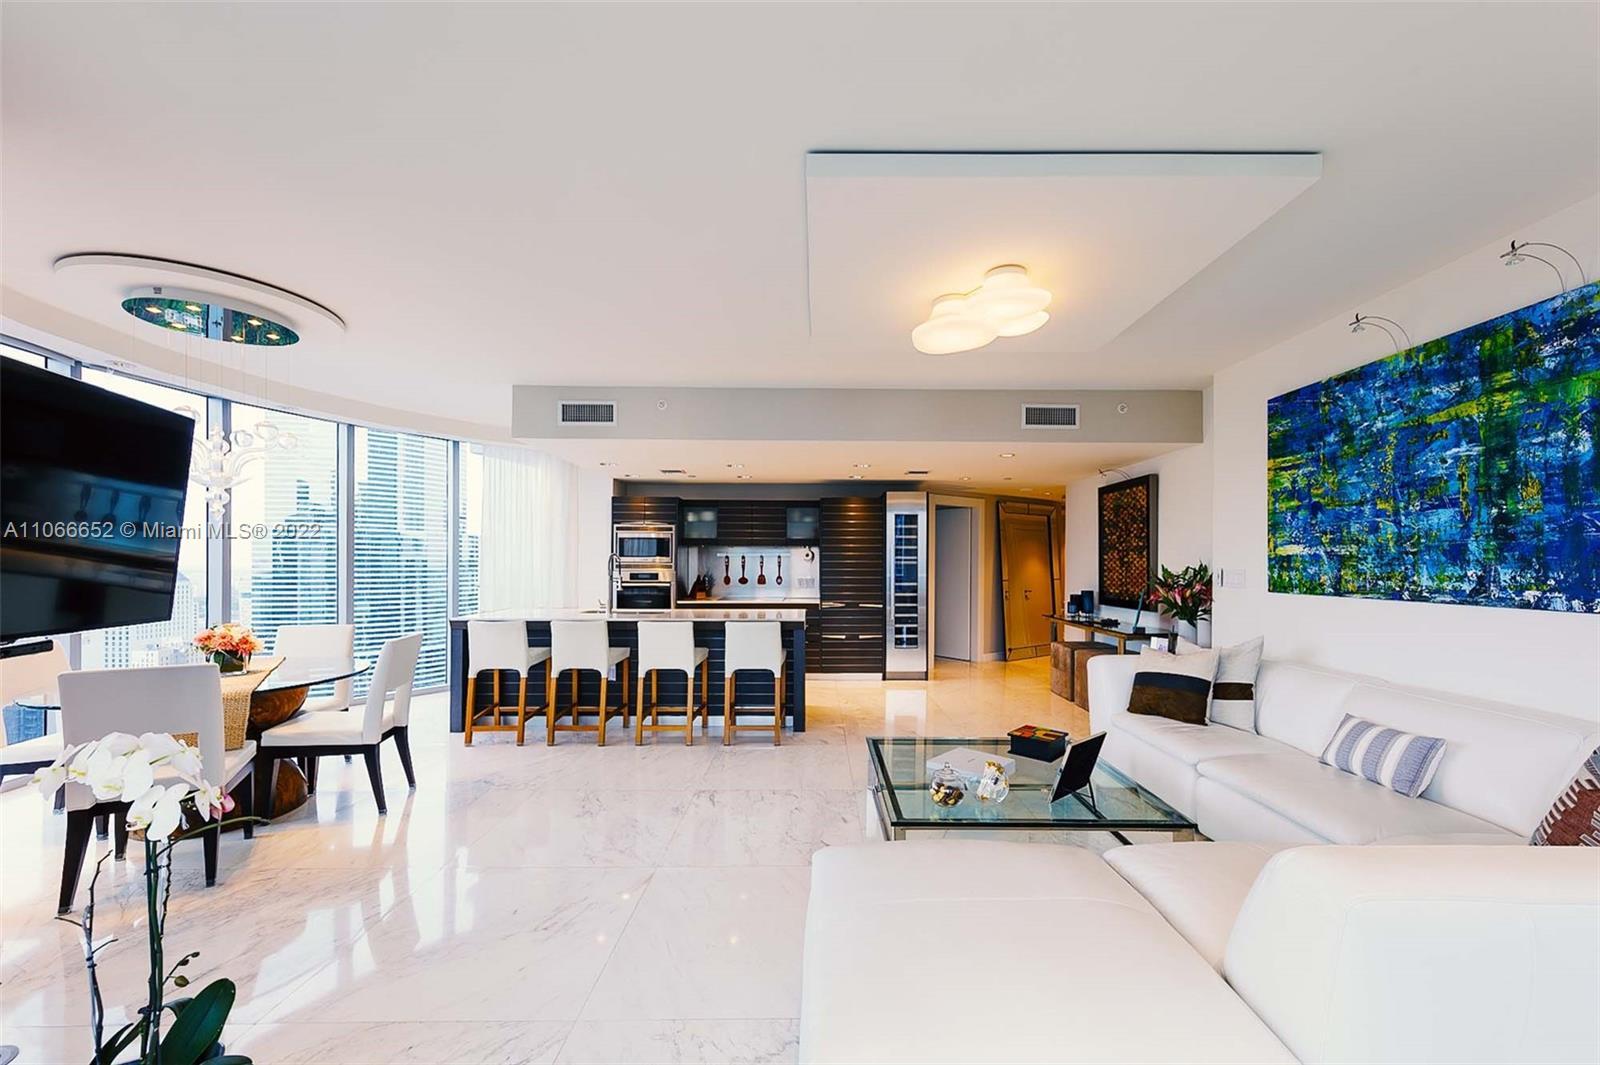 Epic Residences #3502 - 200 Biscayne Boulevard Way #3502, Miami, FL 33131